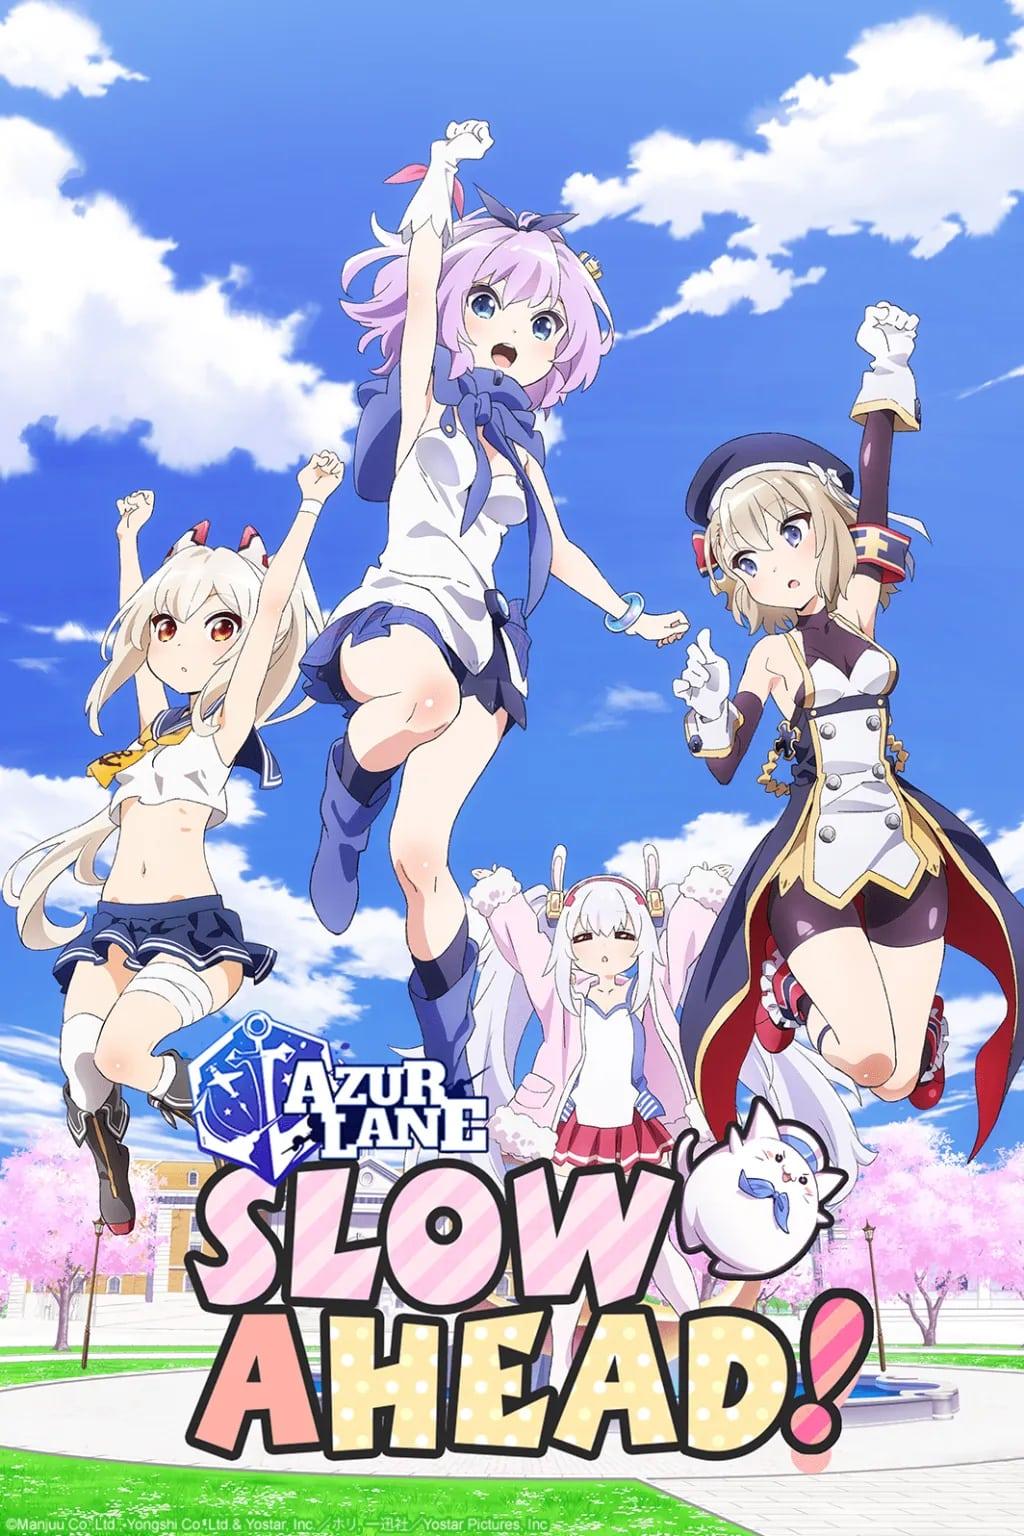 AzurLane: Slow Ahead!